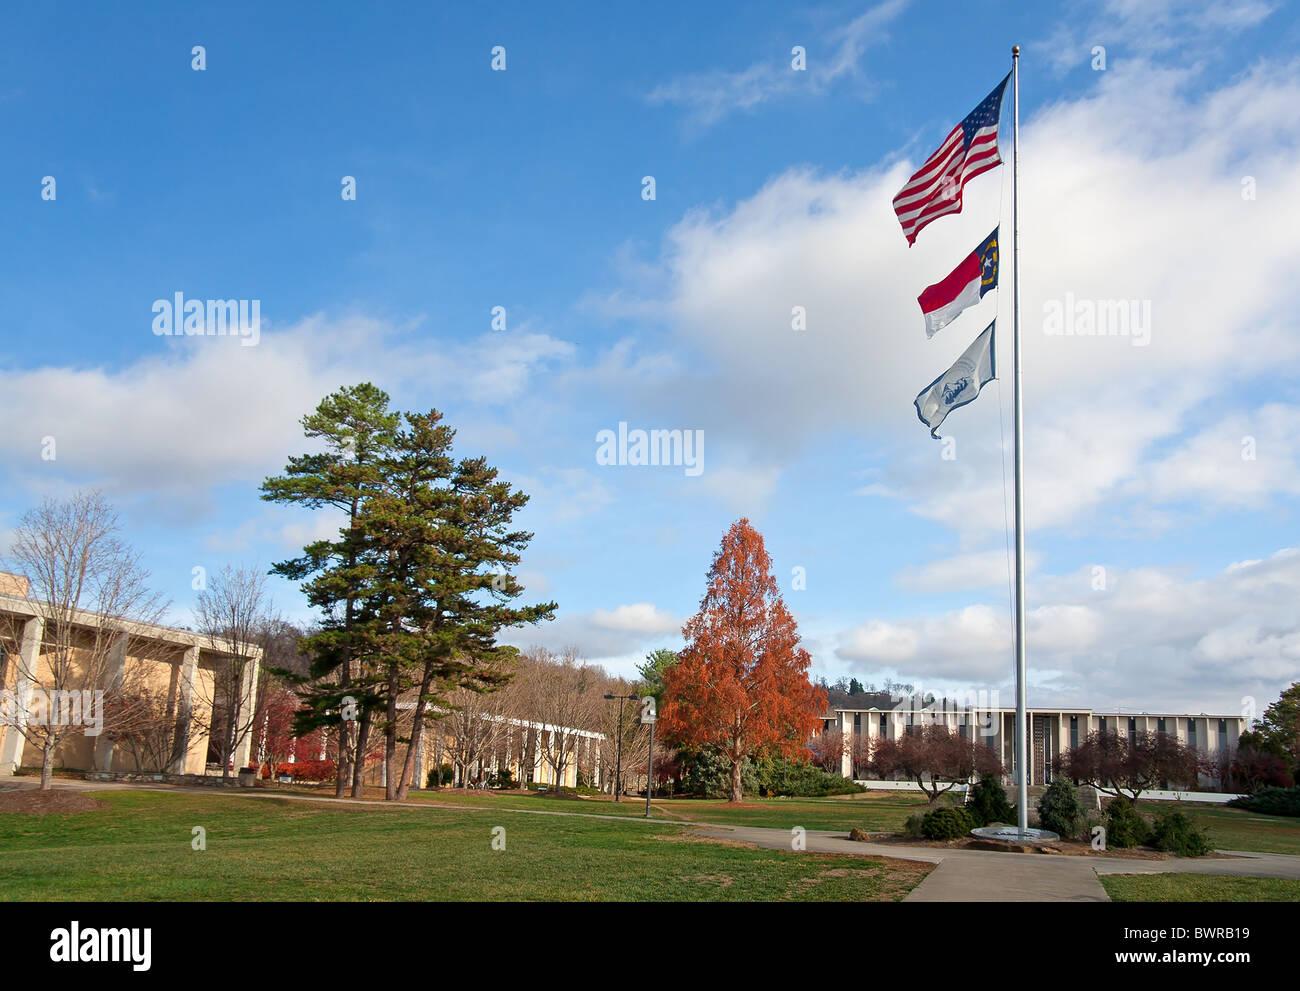 University of North Carolina at Asheville campus. Banque D'Images